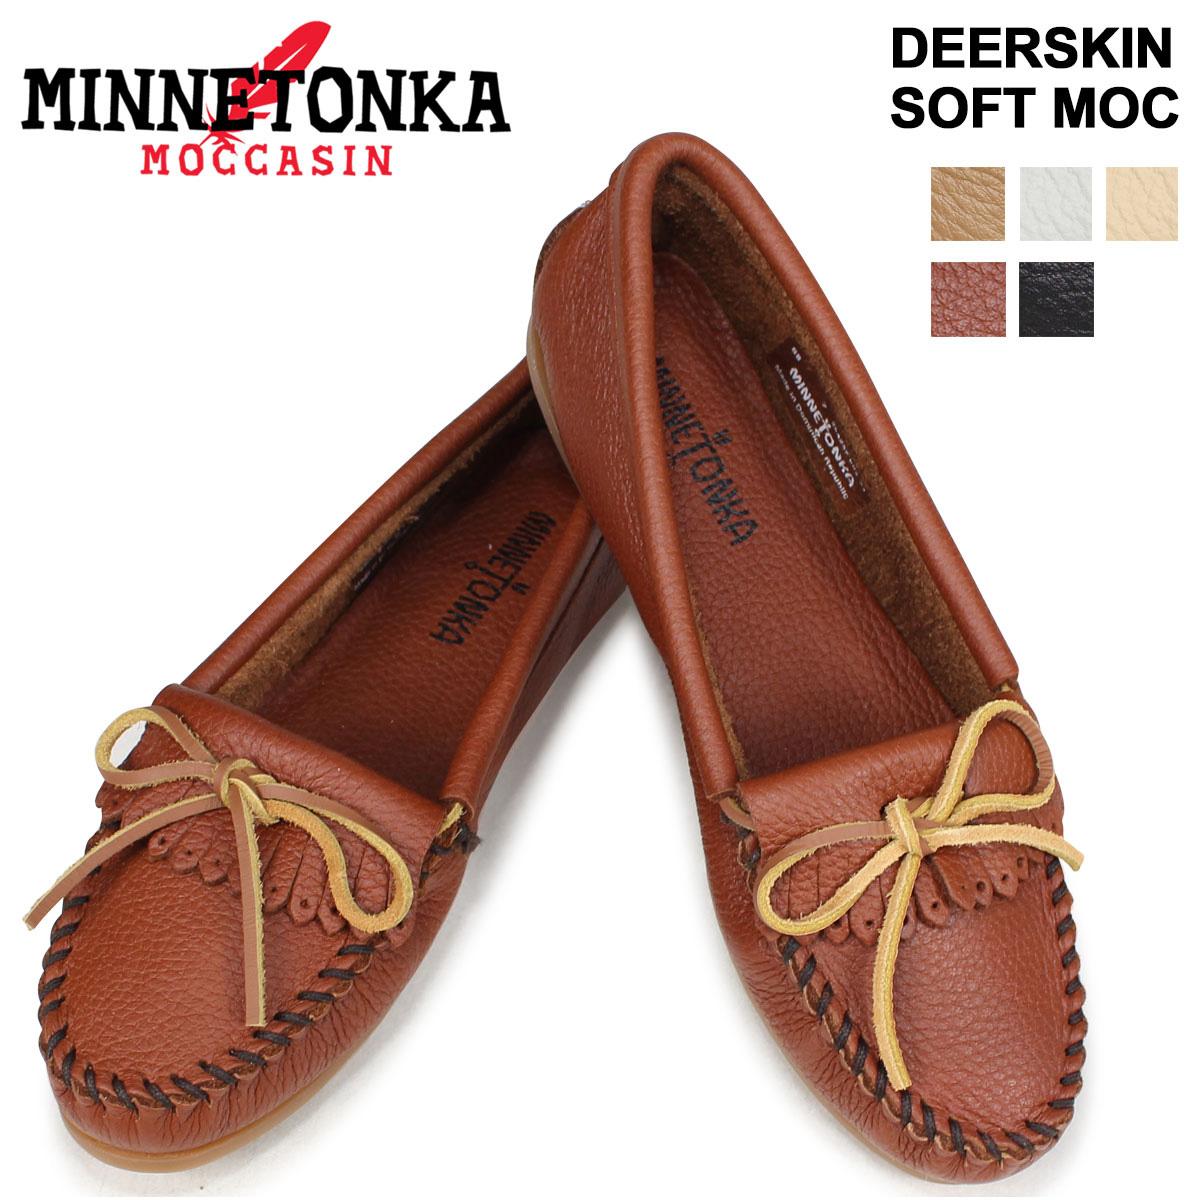 cdaac8722cc SneaK Online Shop: Mine Tonka MINNETONKA moccasins deerskin software ...